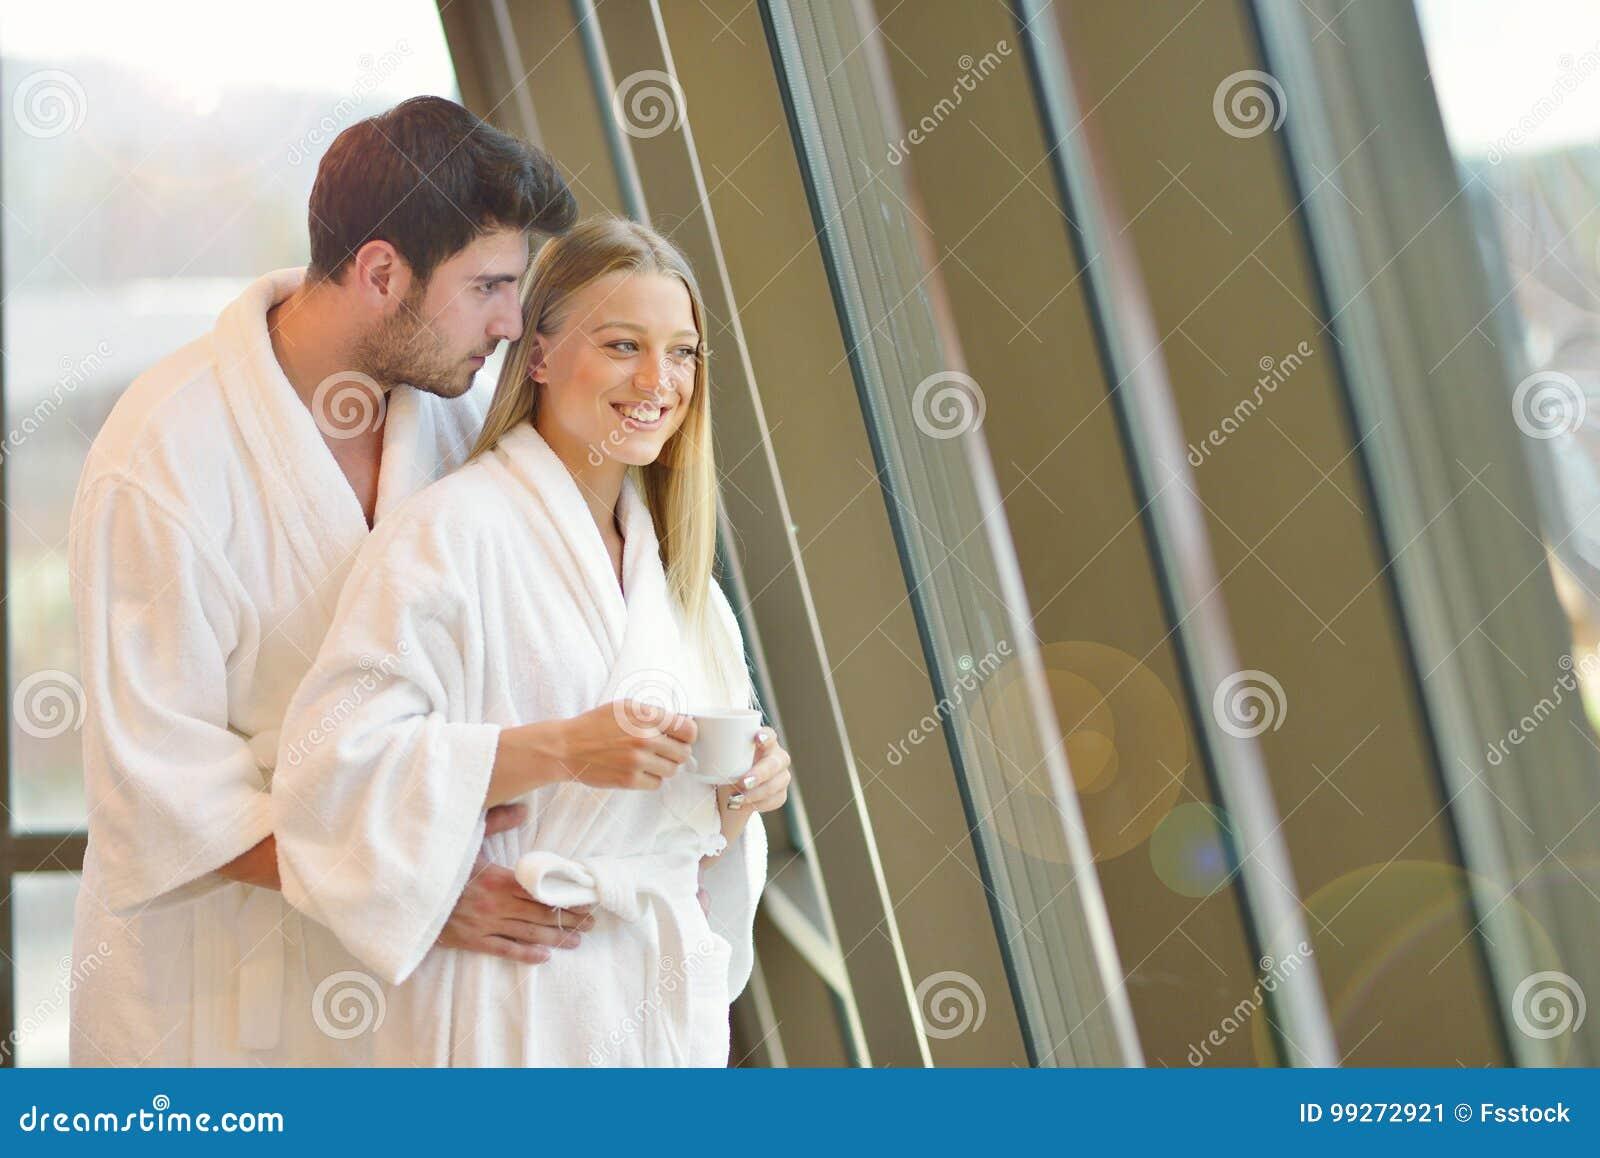 Couple enjoying wellness weekend and spa